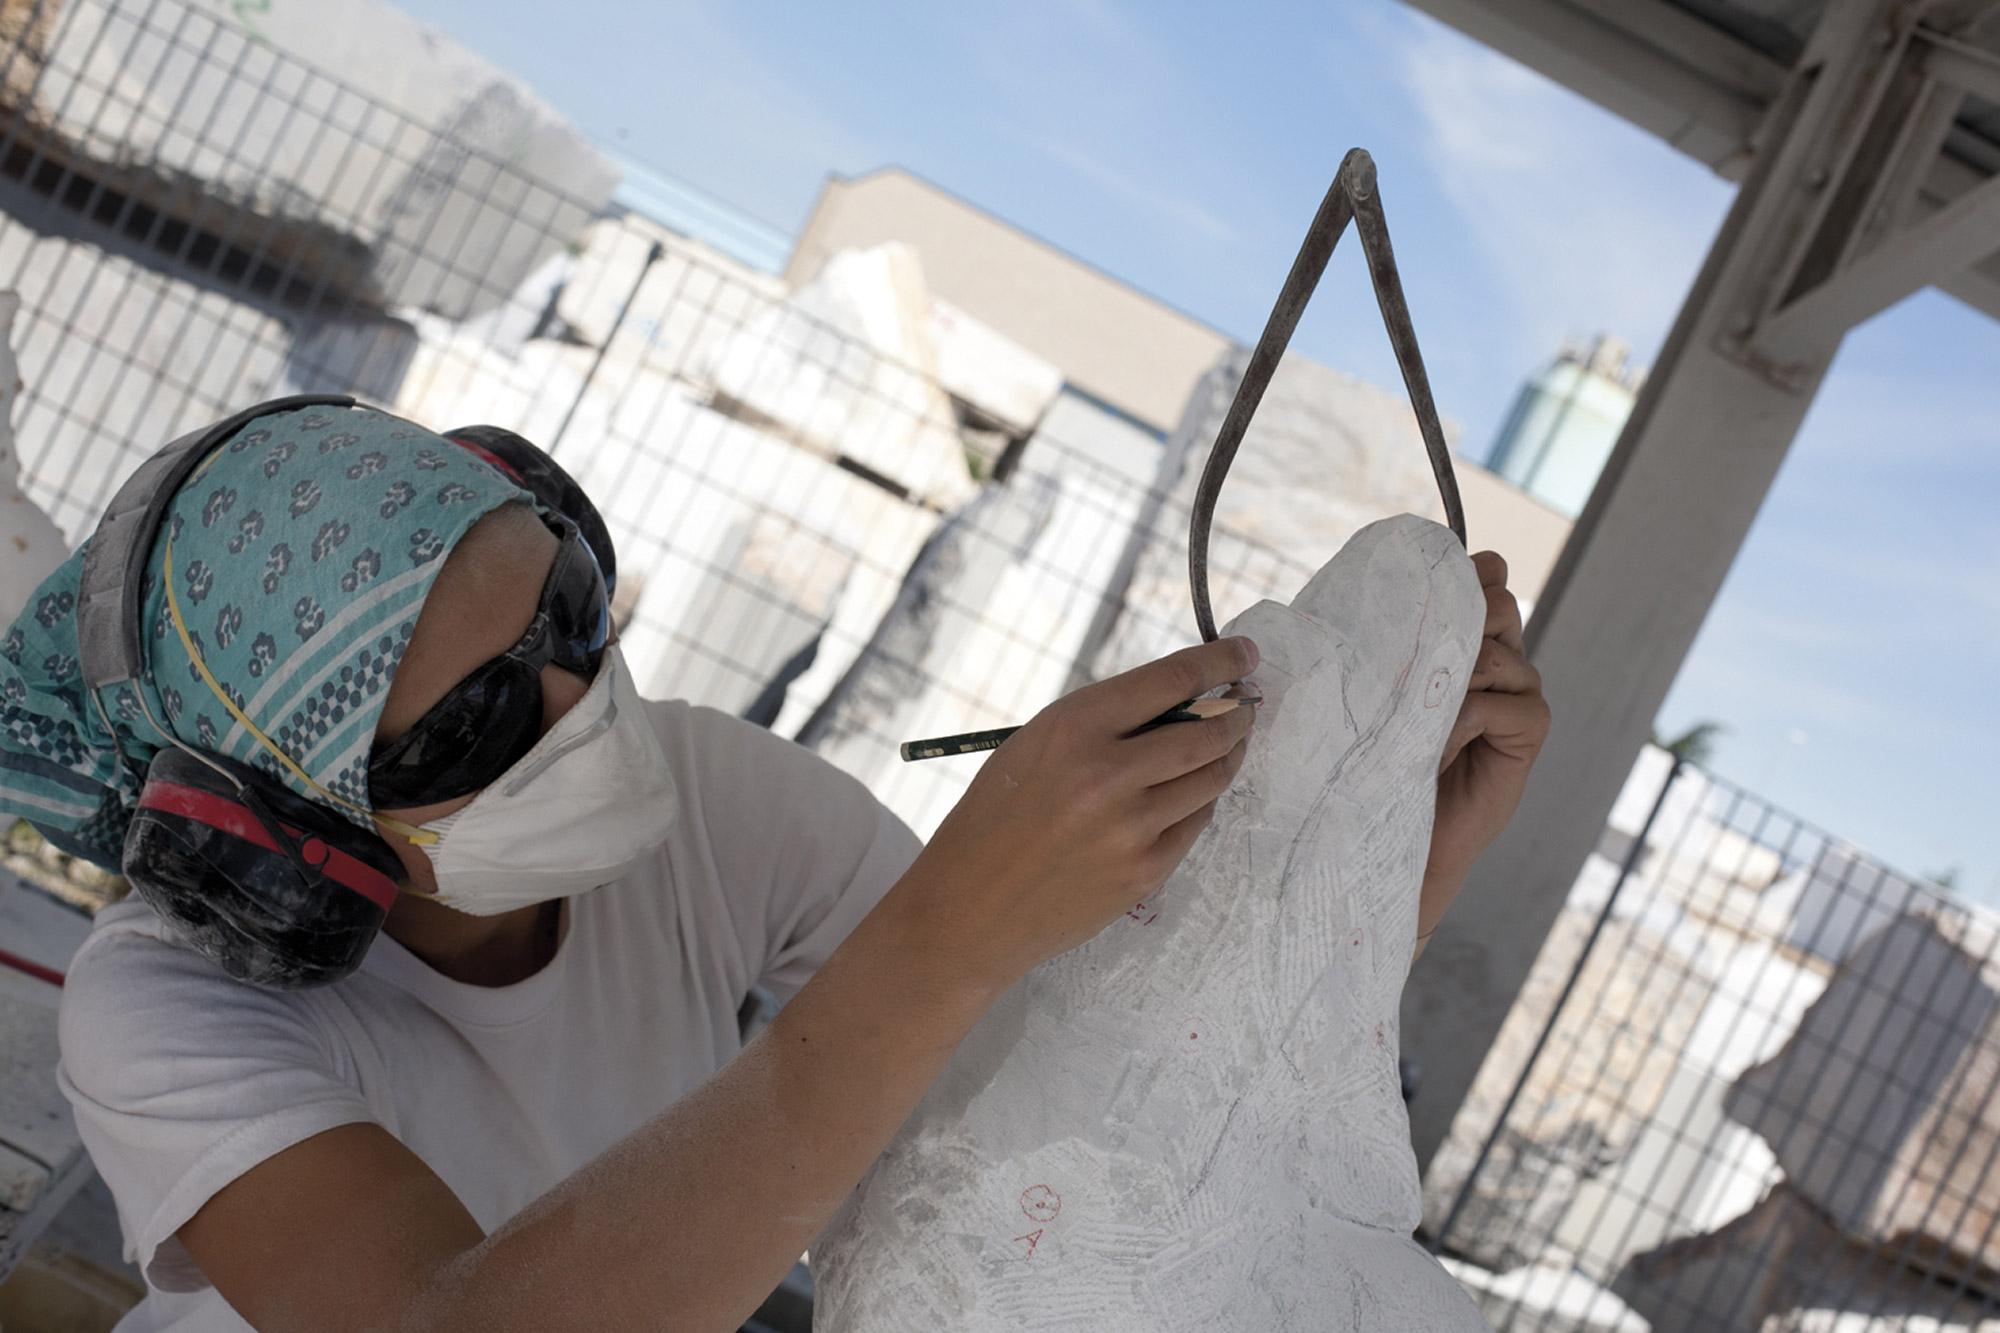 New-York-Academy-of-Art-Carrara-Residency-Heather-Personett-Zoe-Suenson-Taylor20171213_0054.jpg